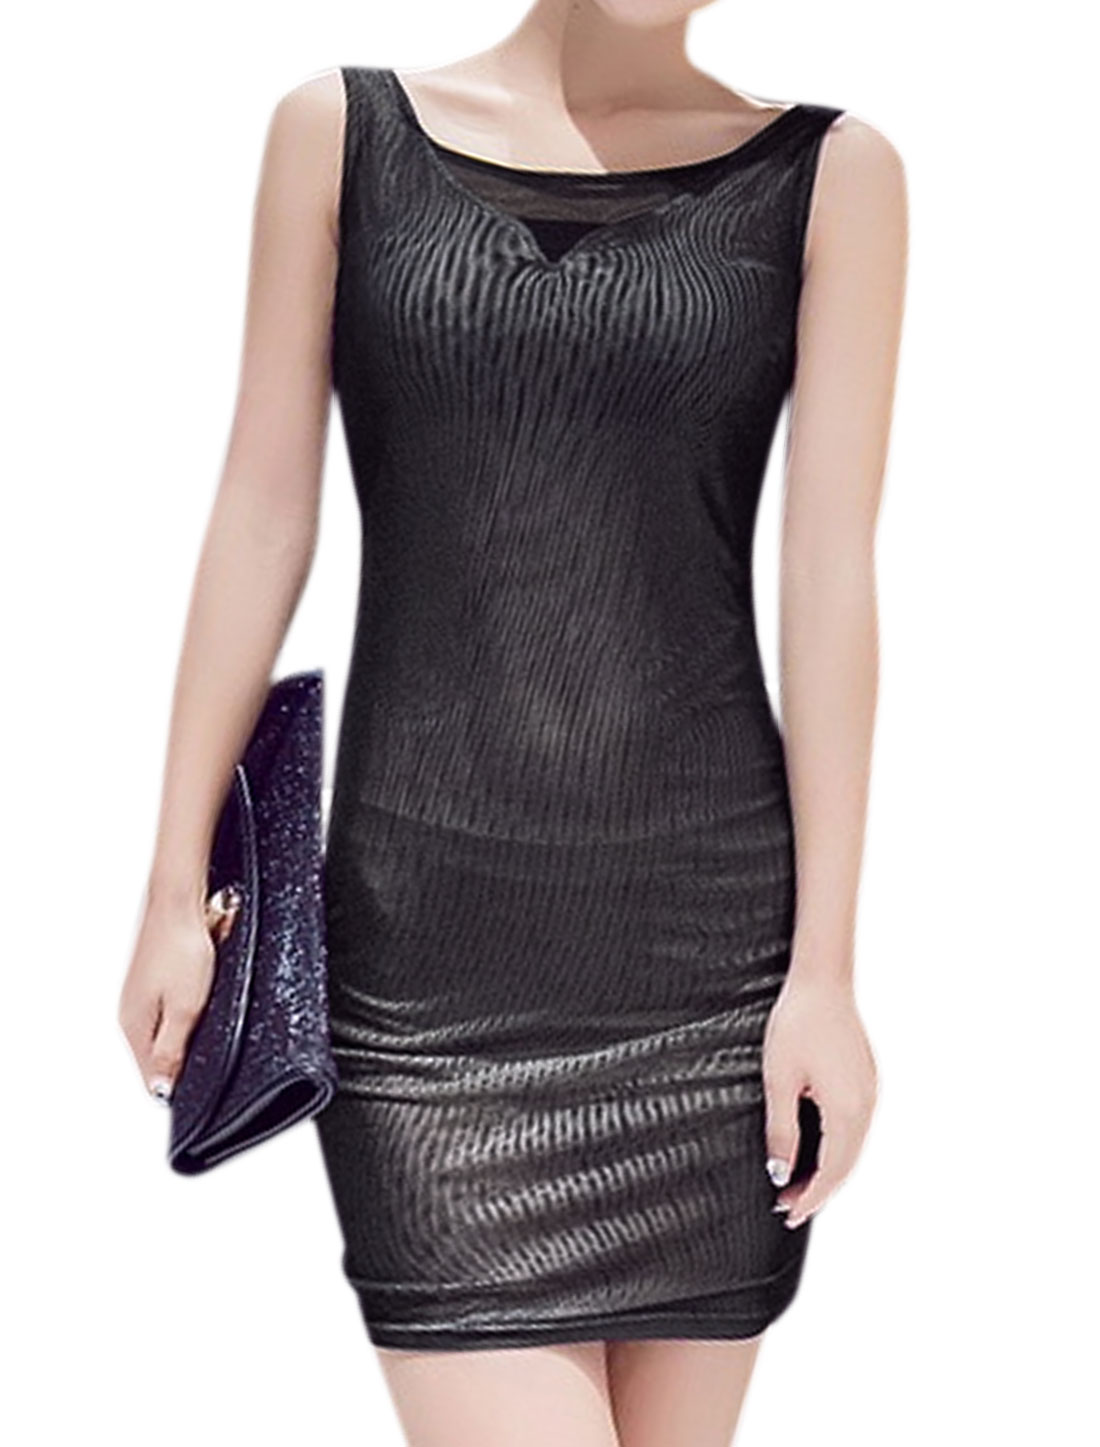 Women Scoop Neck Sleeveless Stretchy Mini Mesh Wiggle Dress Black XS